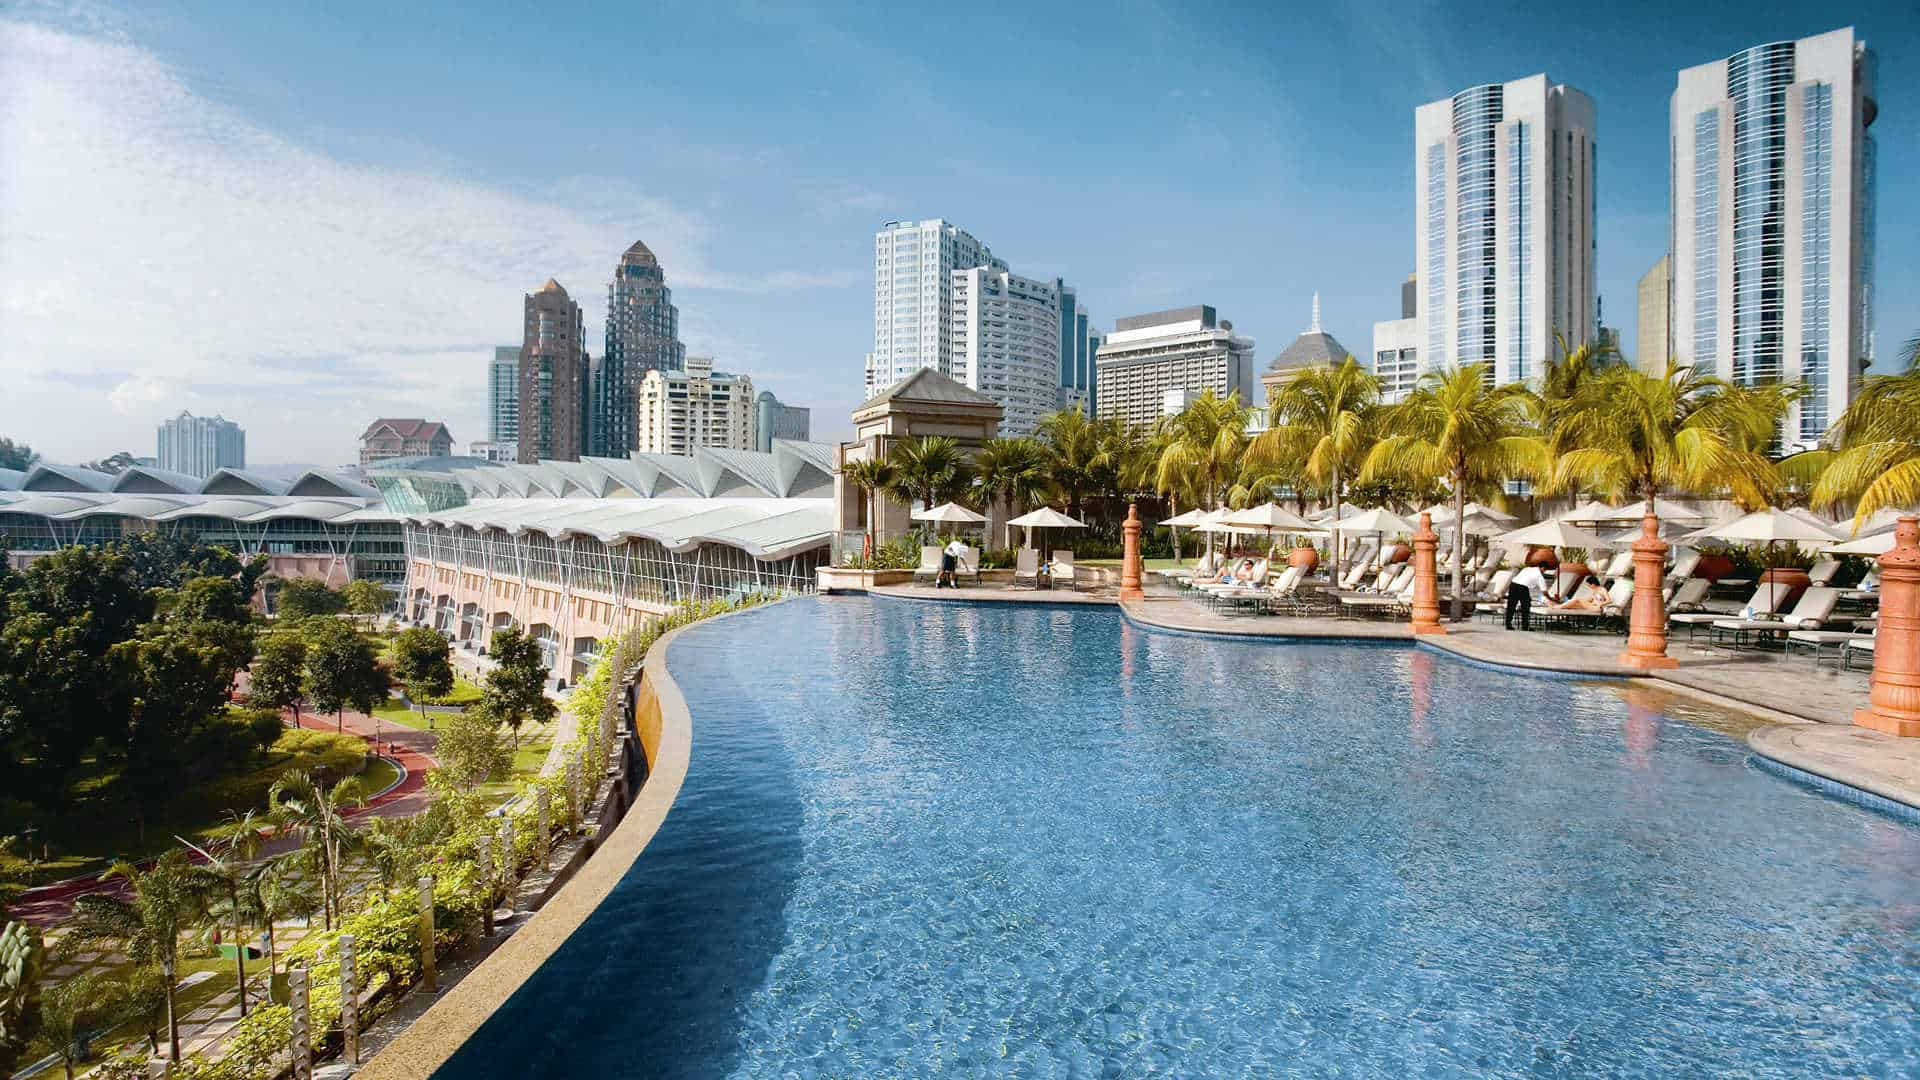 Mandarin Oriental Kuala Lumpur pool